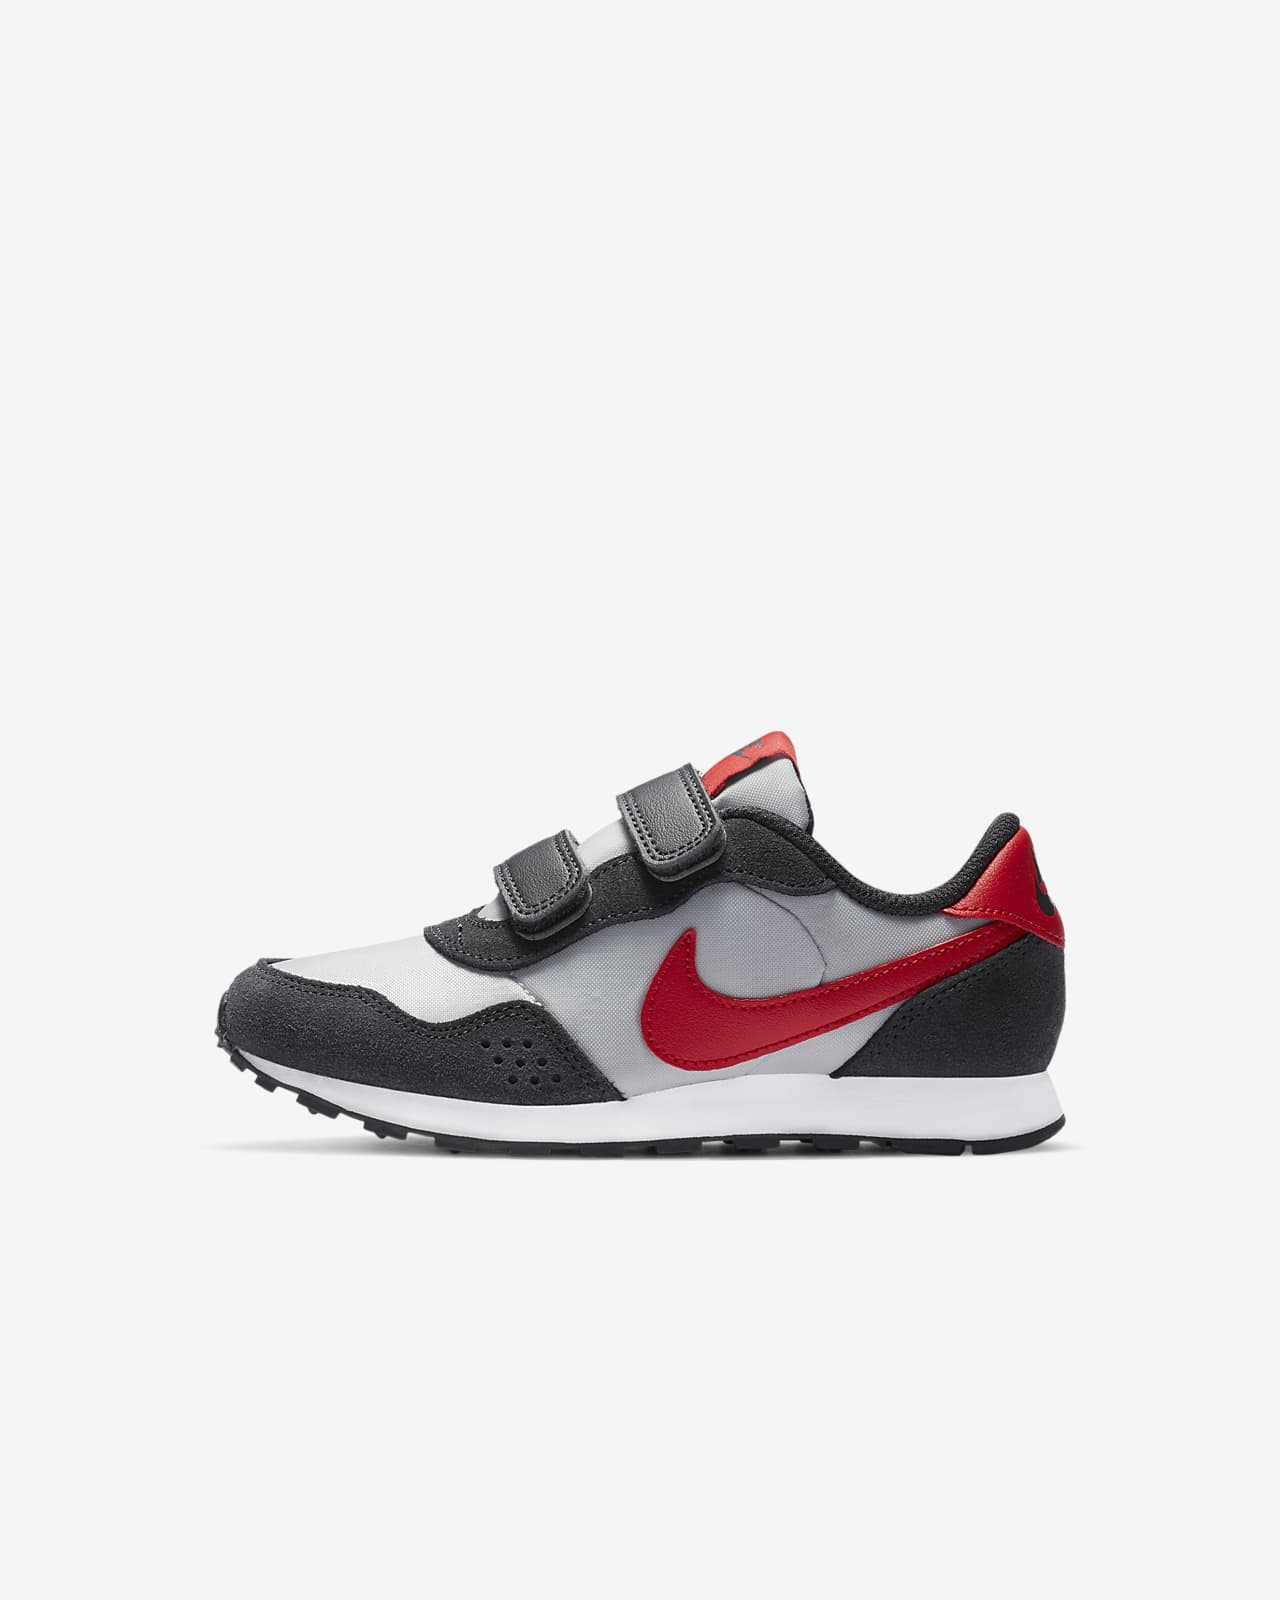 Nike MD Valiant Schuh für jüngere Kinder